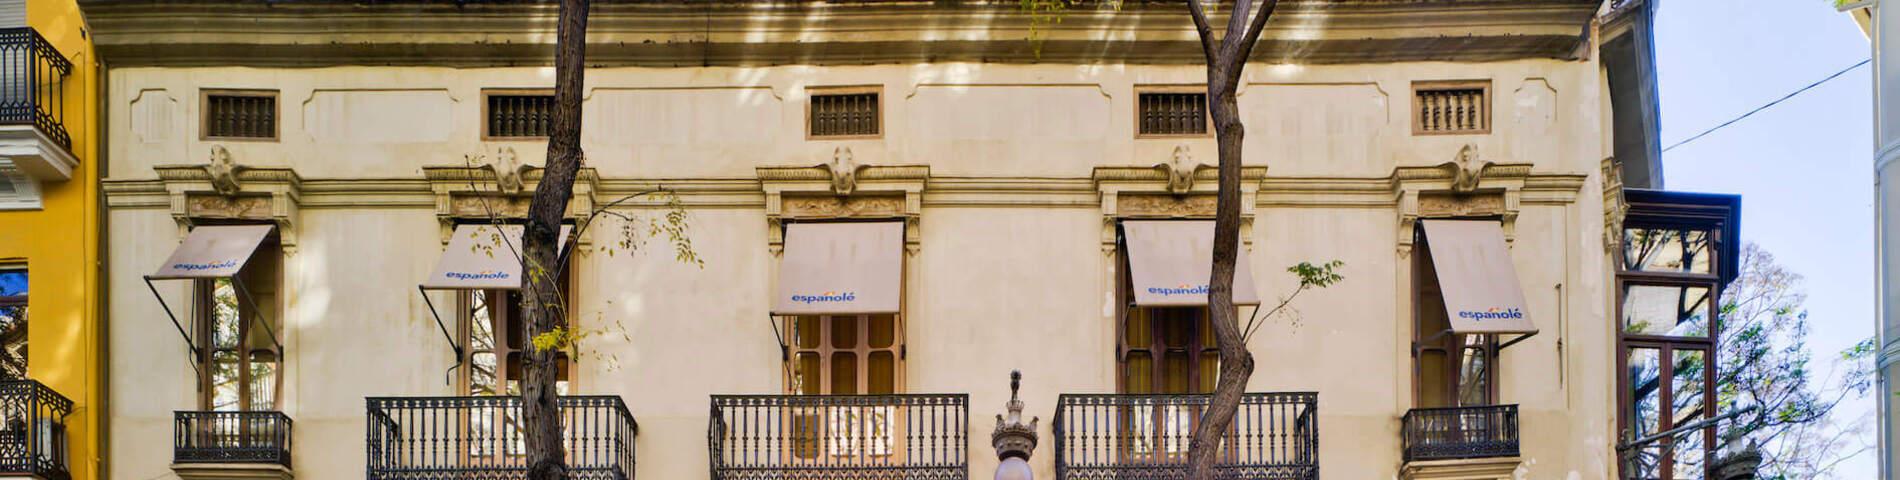 Españole International House画像1